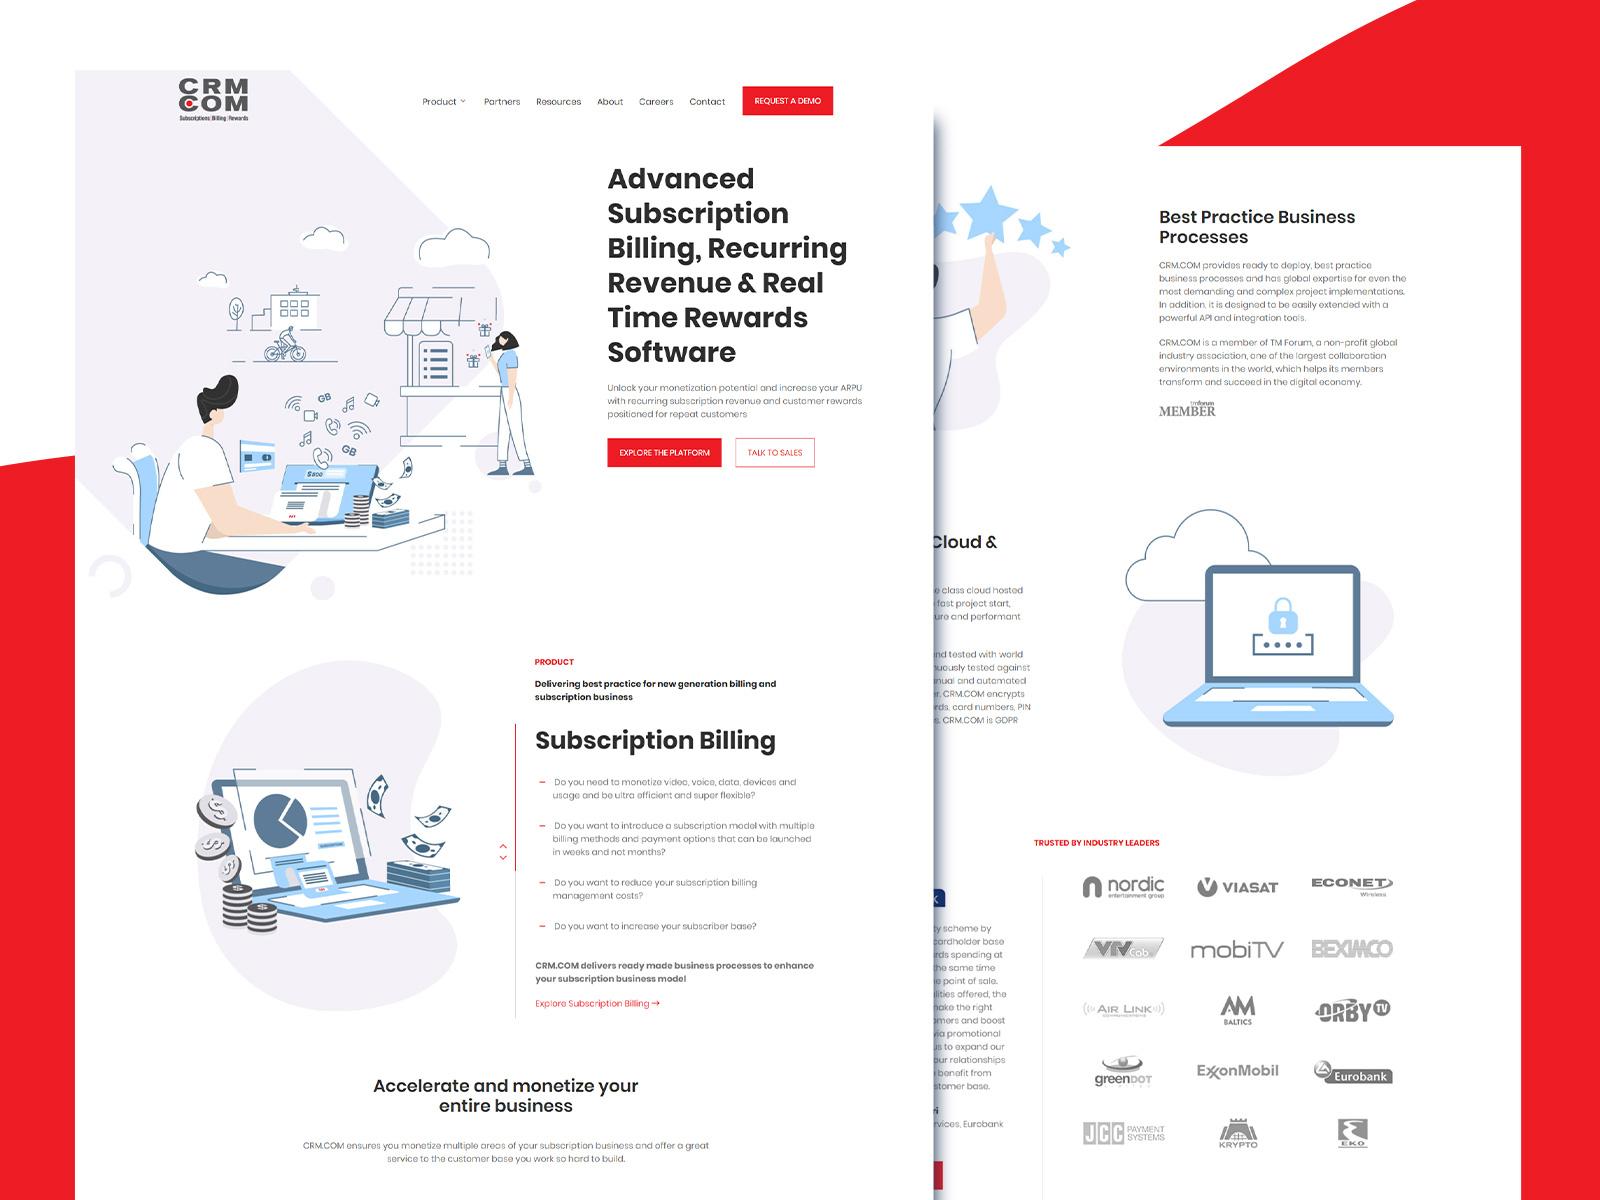 Illustrated Web Design Web Development For Crm Com By Blend Digital Agency On Dribbble